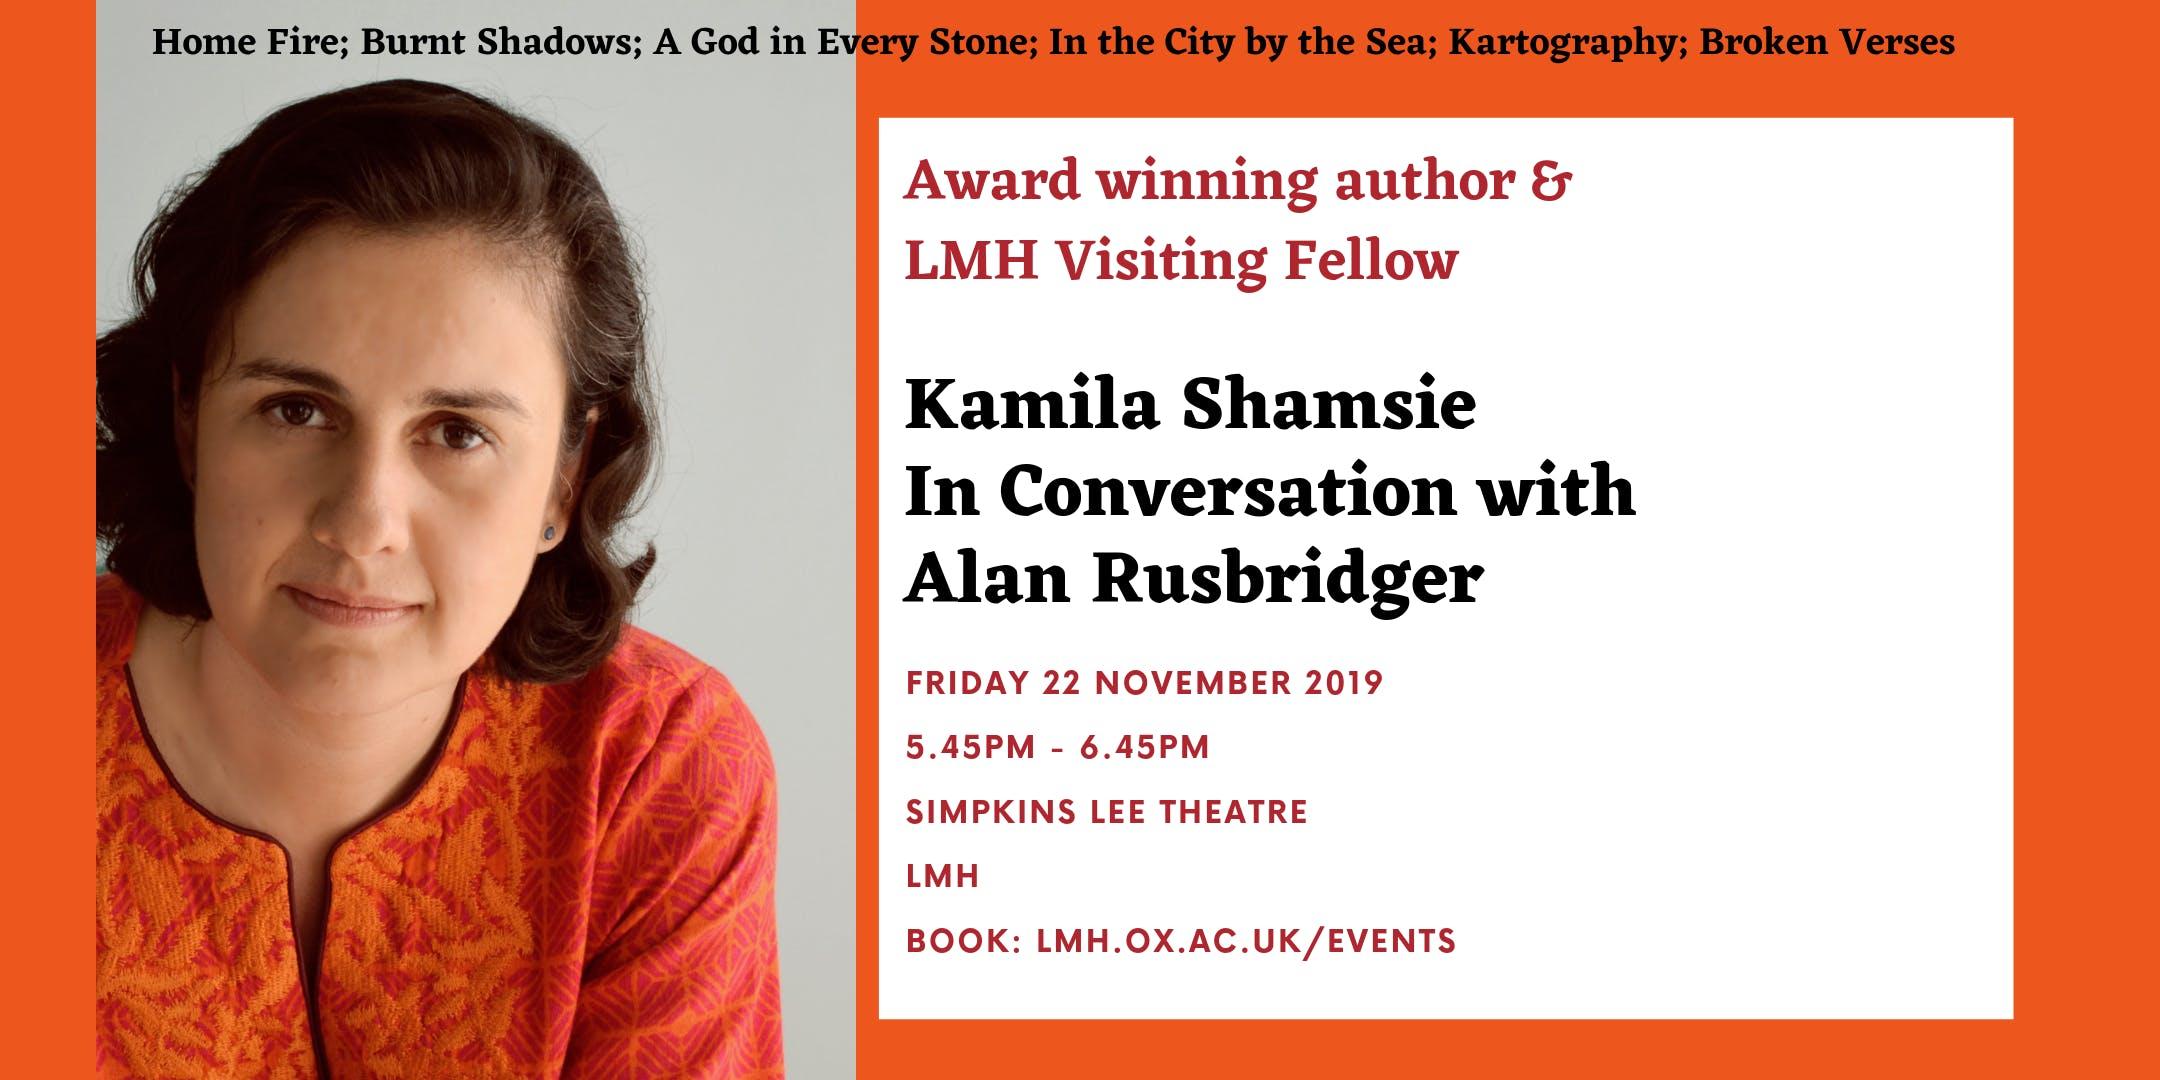 Kamila Shamsie In Conversation with Alan Rusbridger